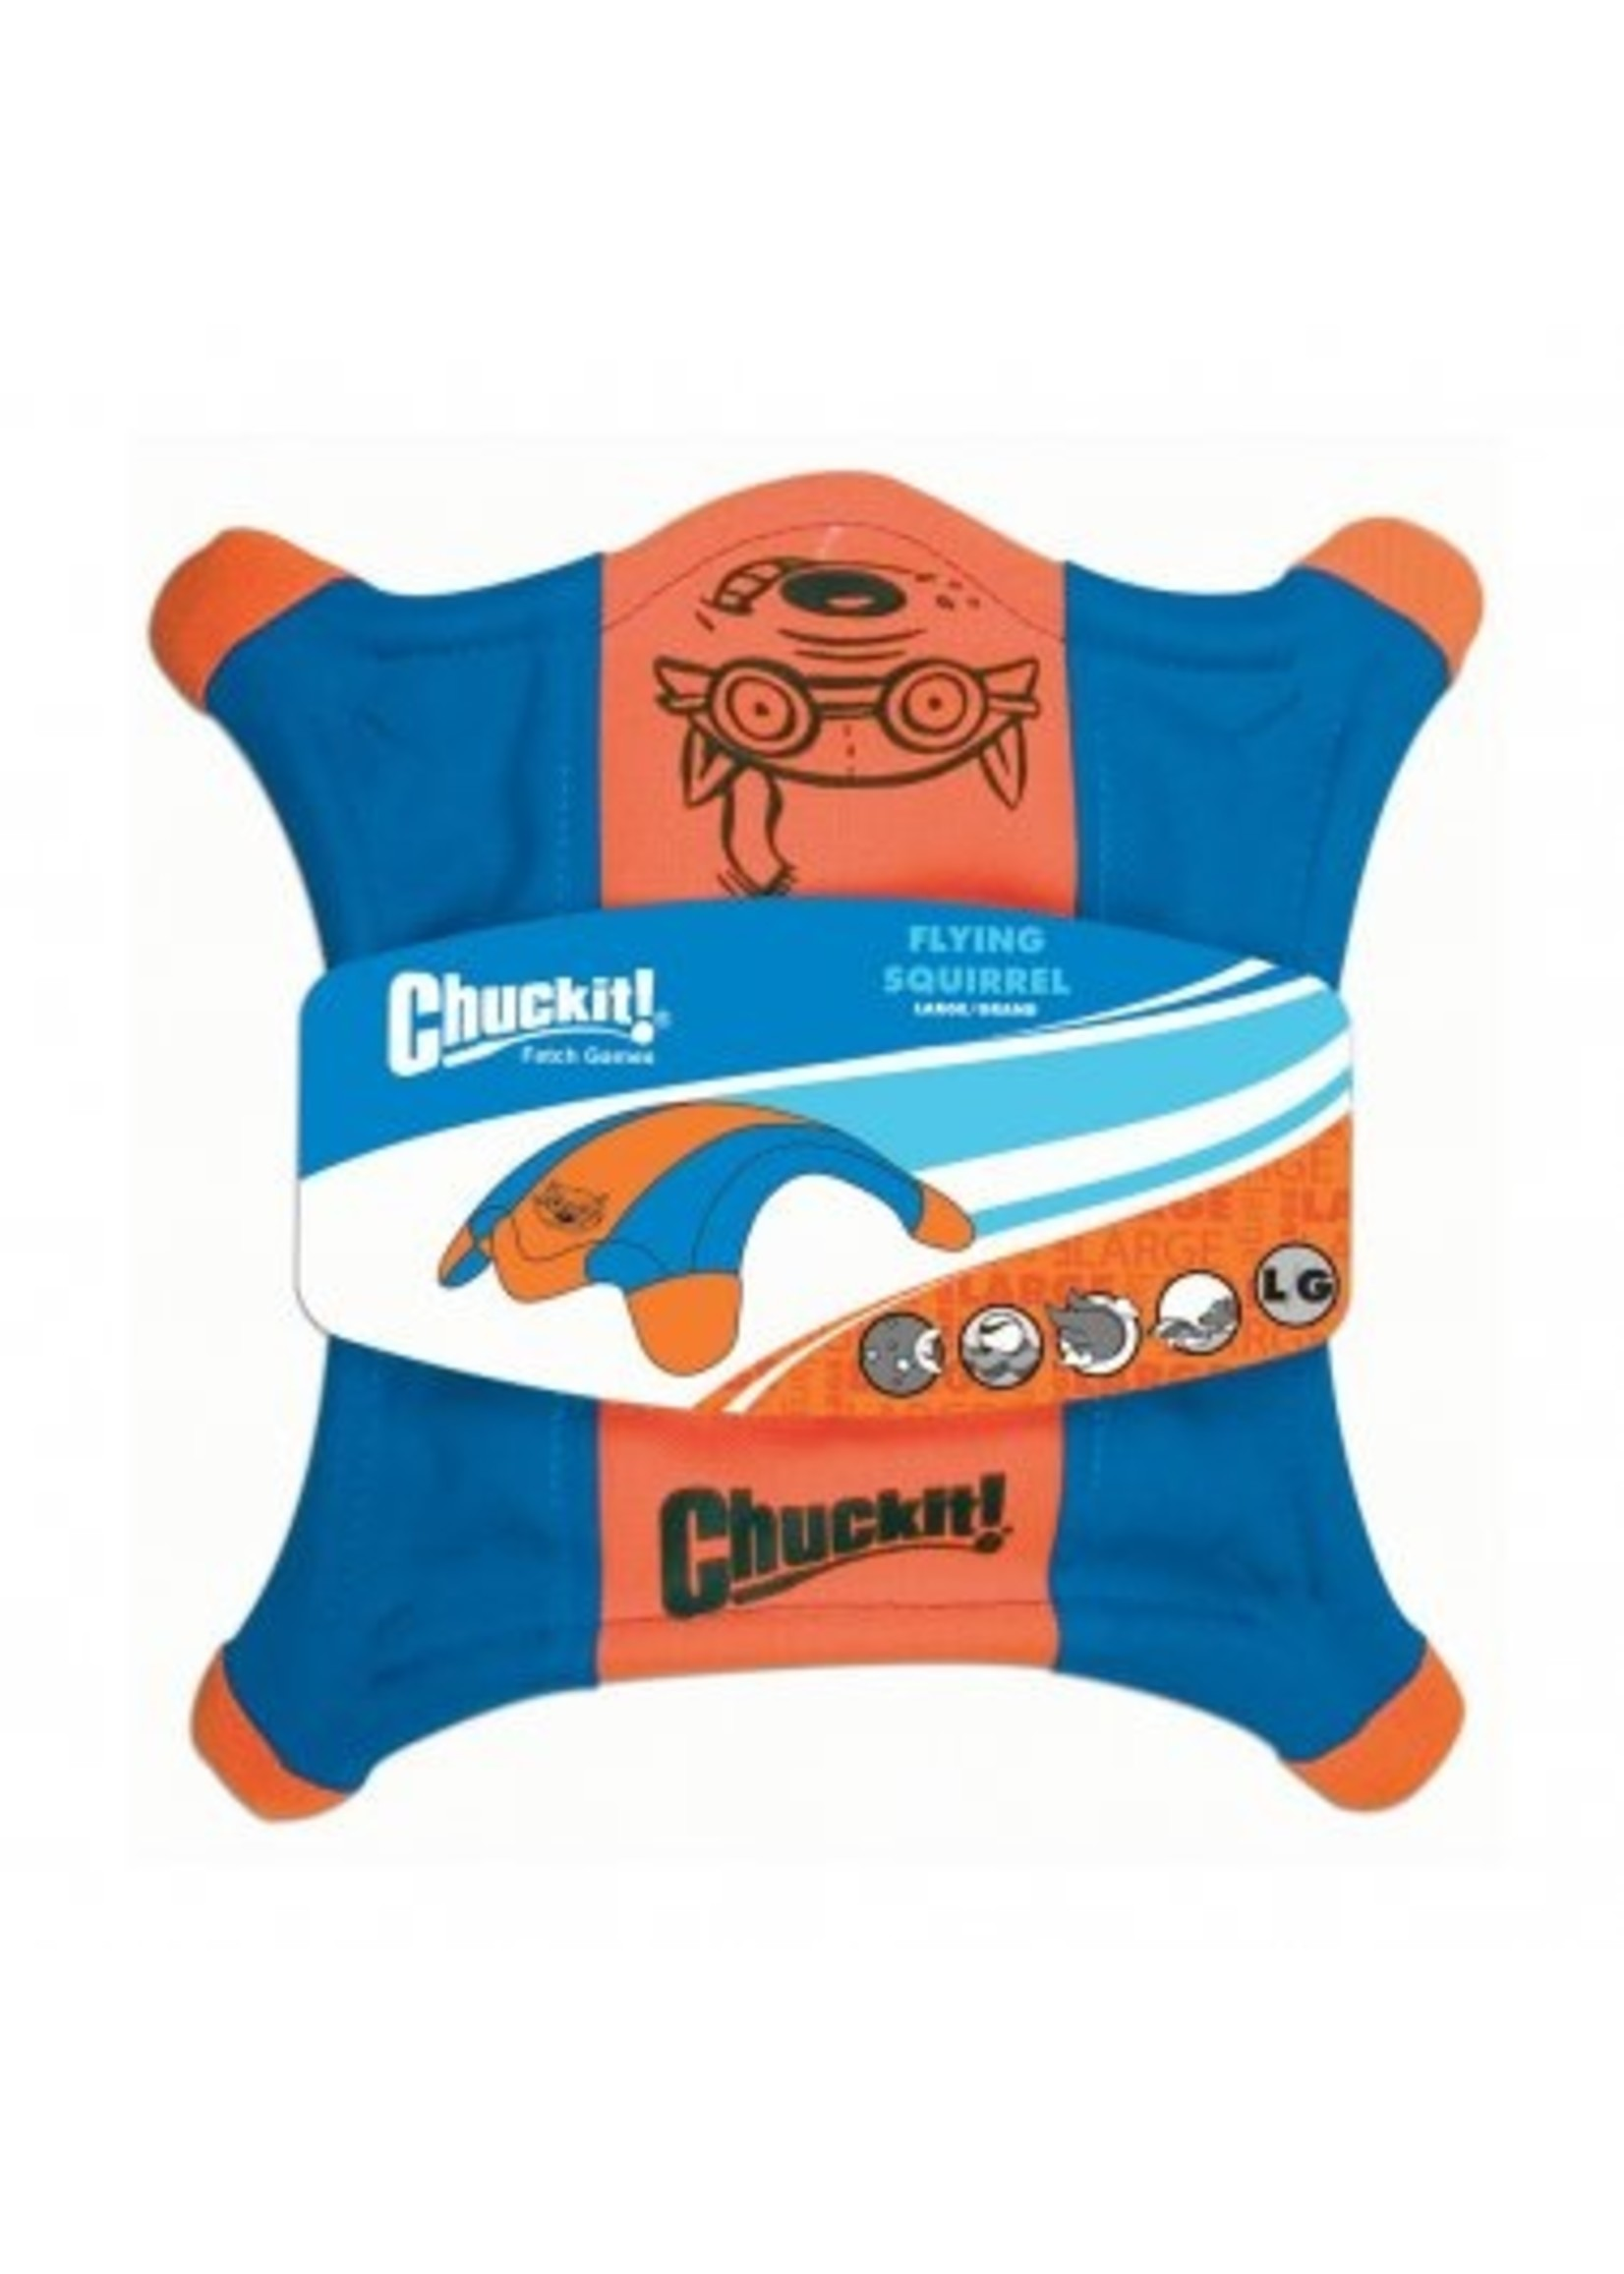 Chuckit!® Chuckit! Flying Squirrel Lg